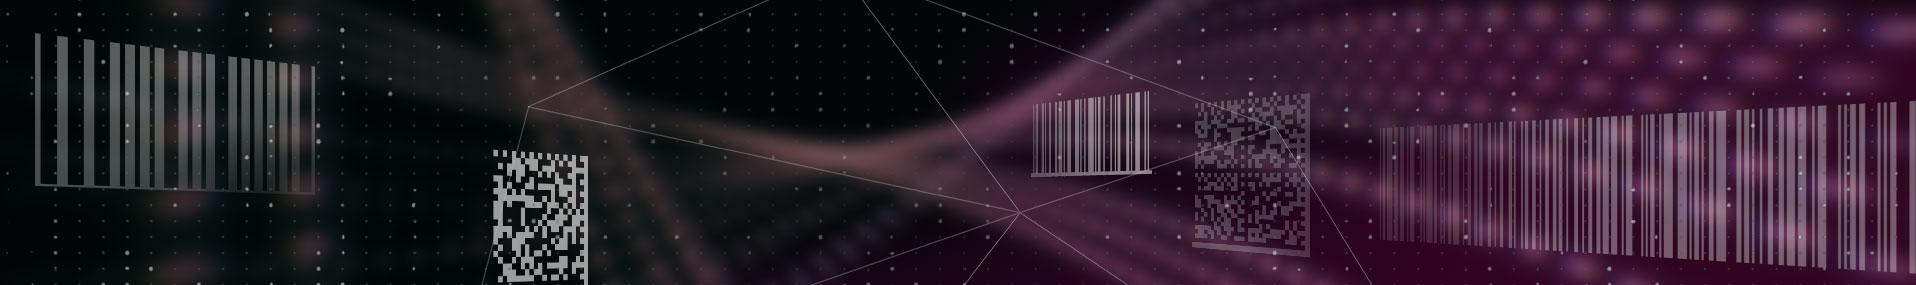 multiple barcode symbologies floating over purple background